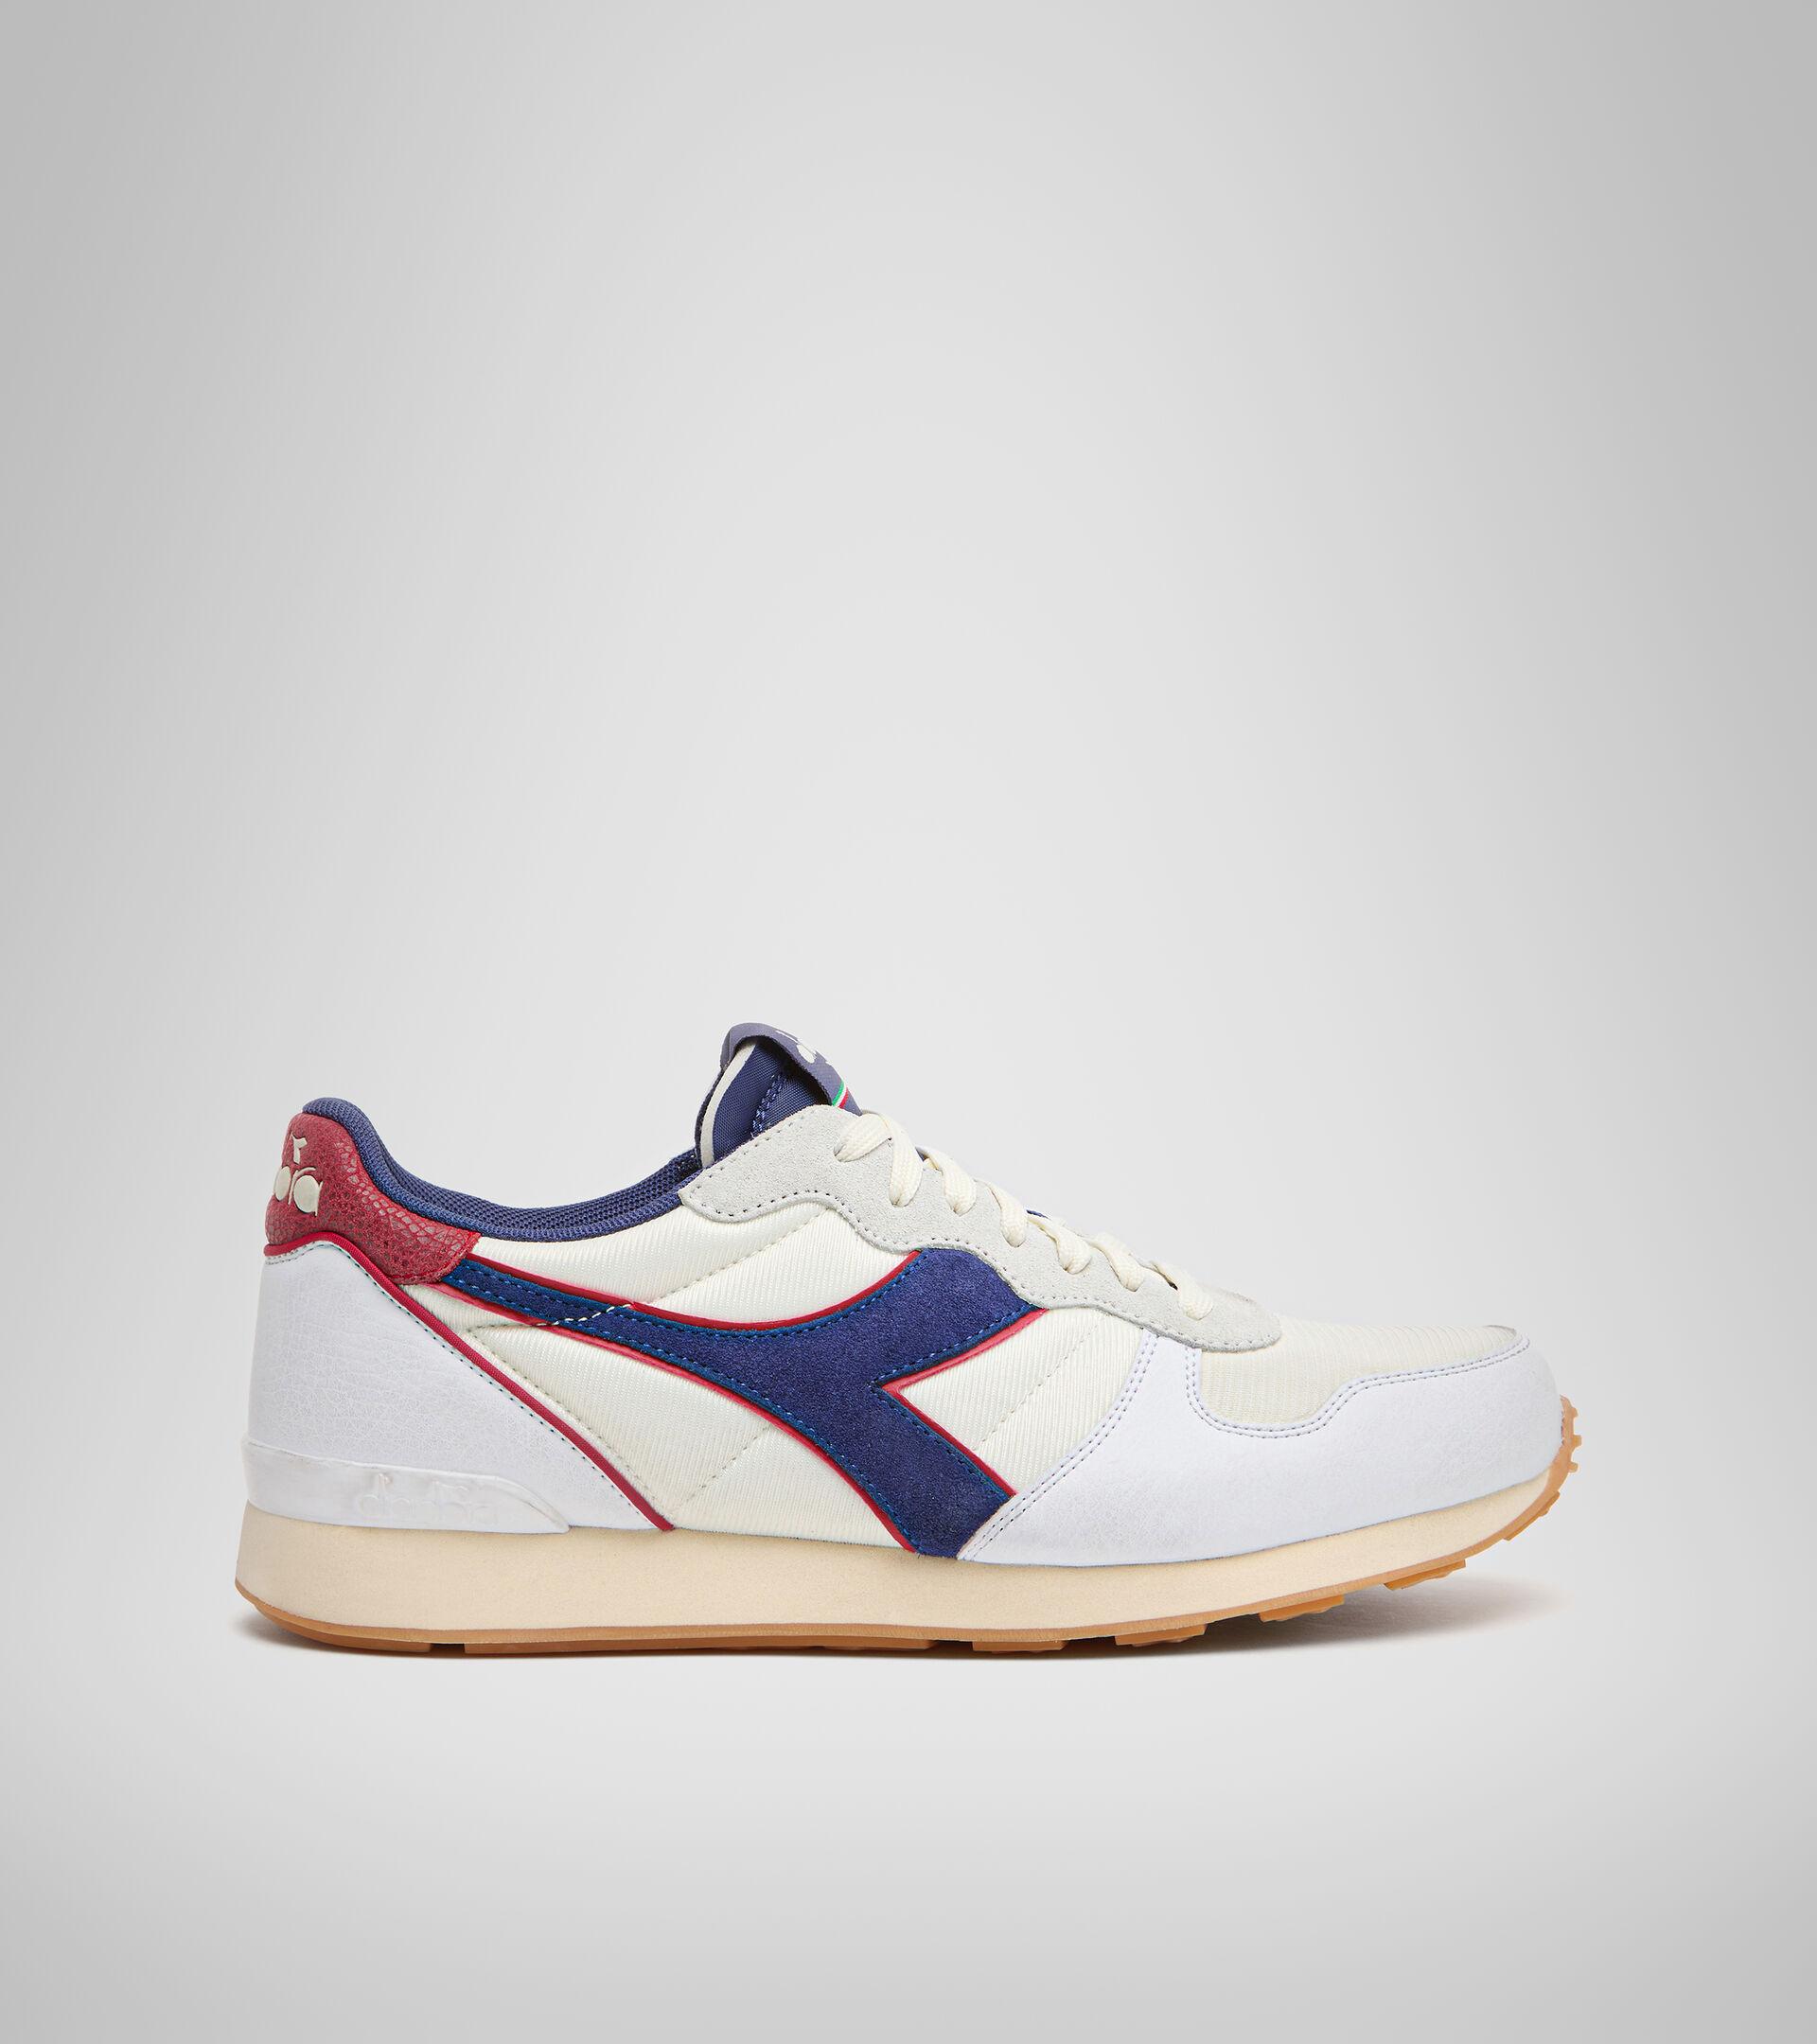 Footwear Sportswear UNISEX CAMARO ICONA WHT/TWILIGHT BL/CHILI PEPPER Diadora